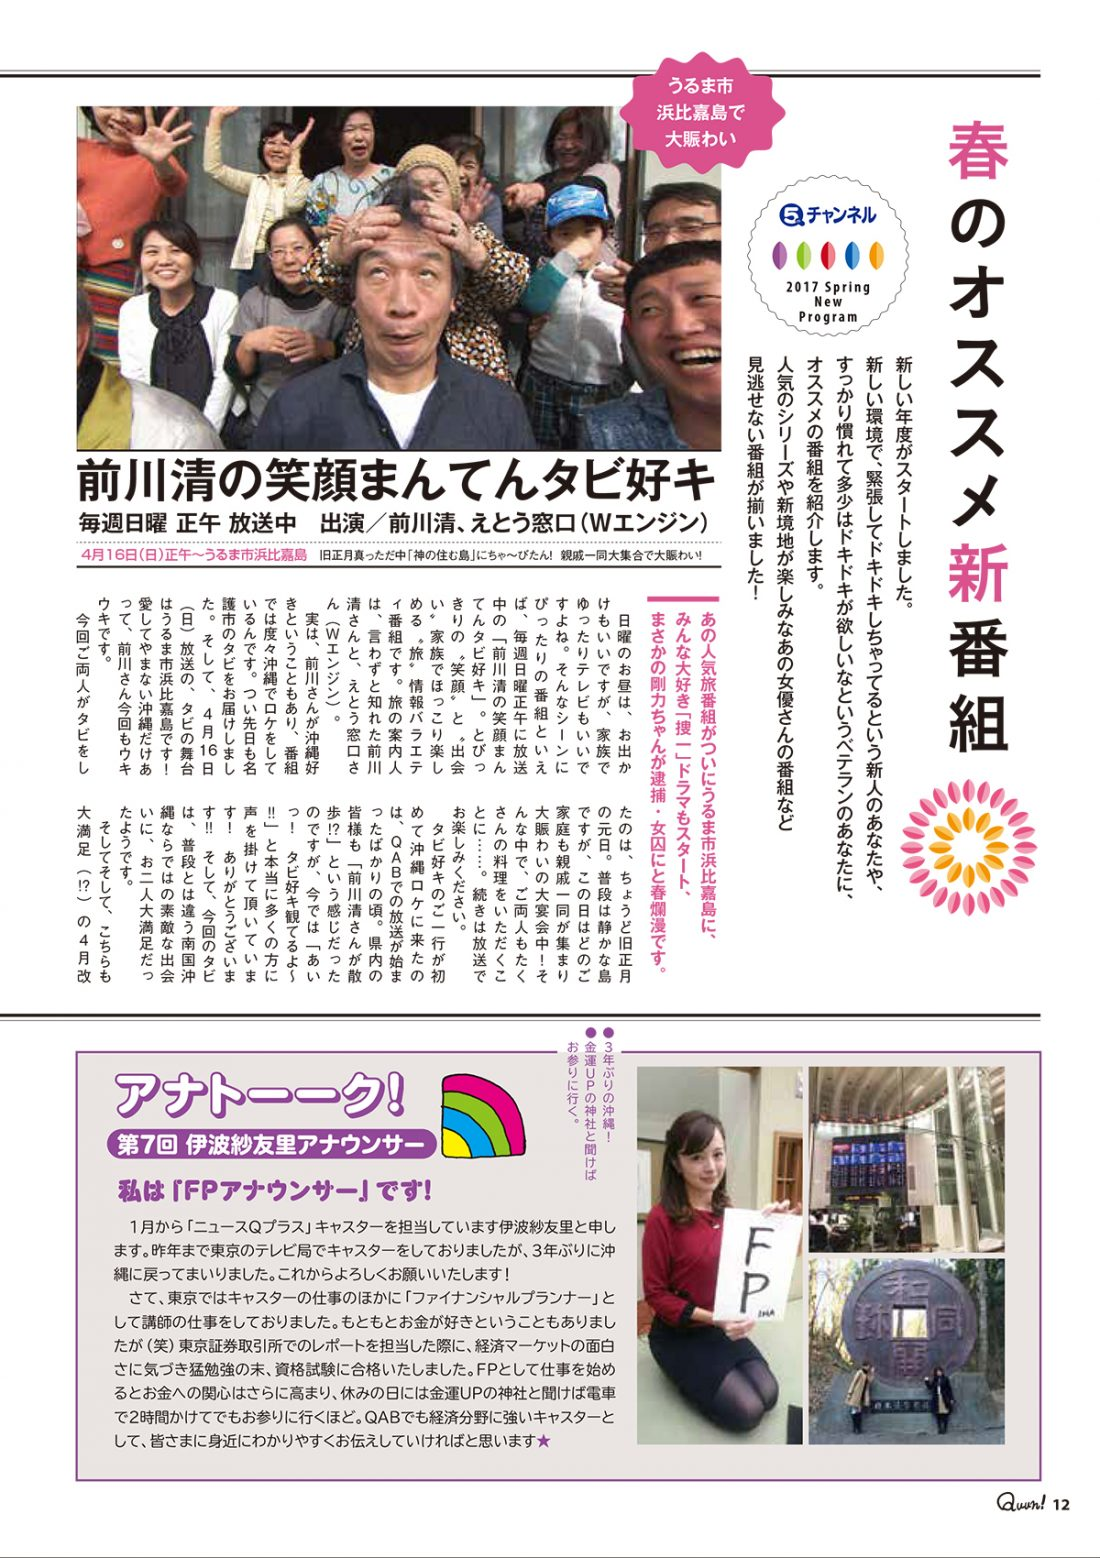 https://www.qab.co.jp/qgoro/wp-content/uploads/quun_0714-1100x1558.jpg